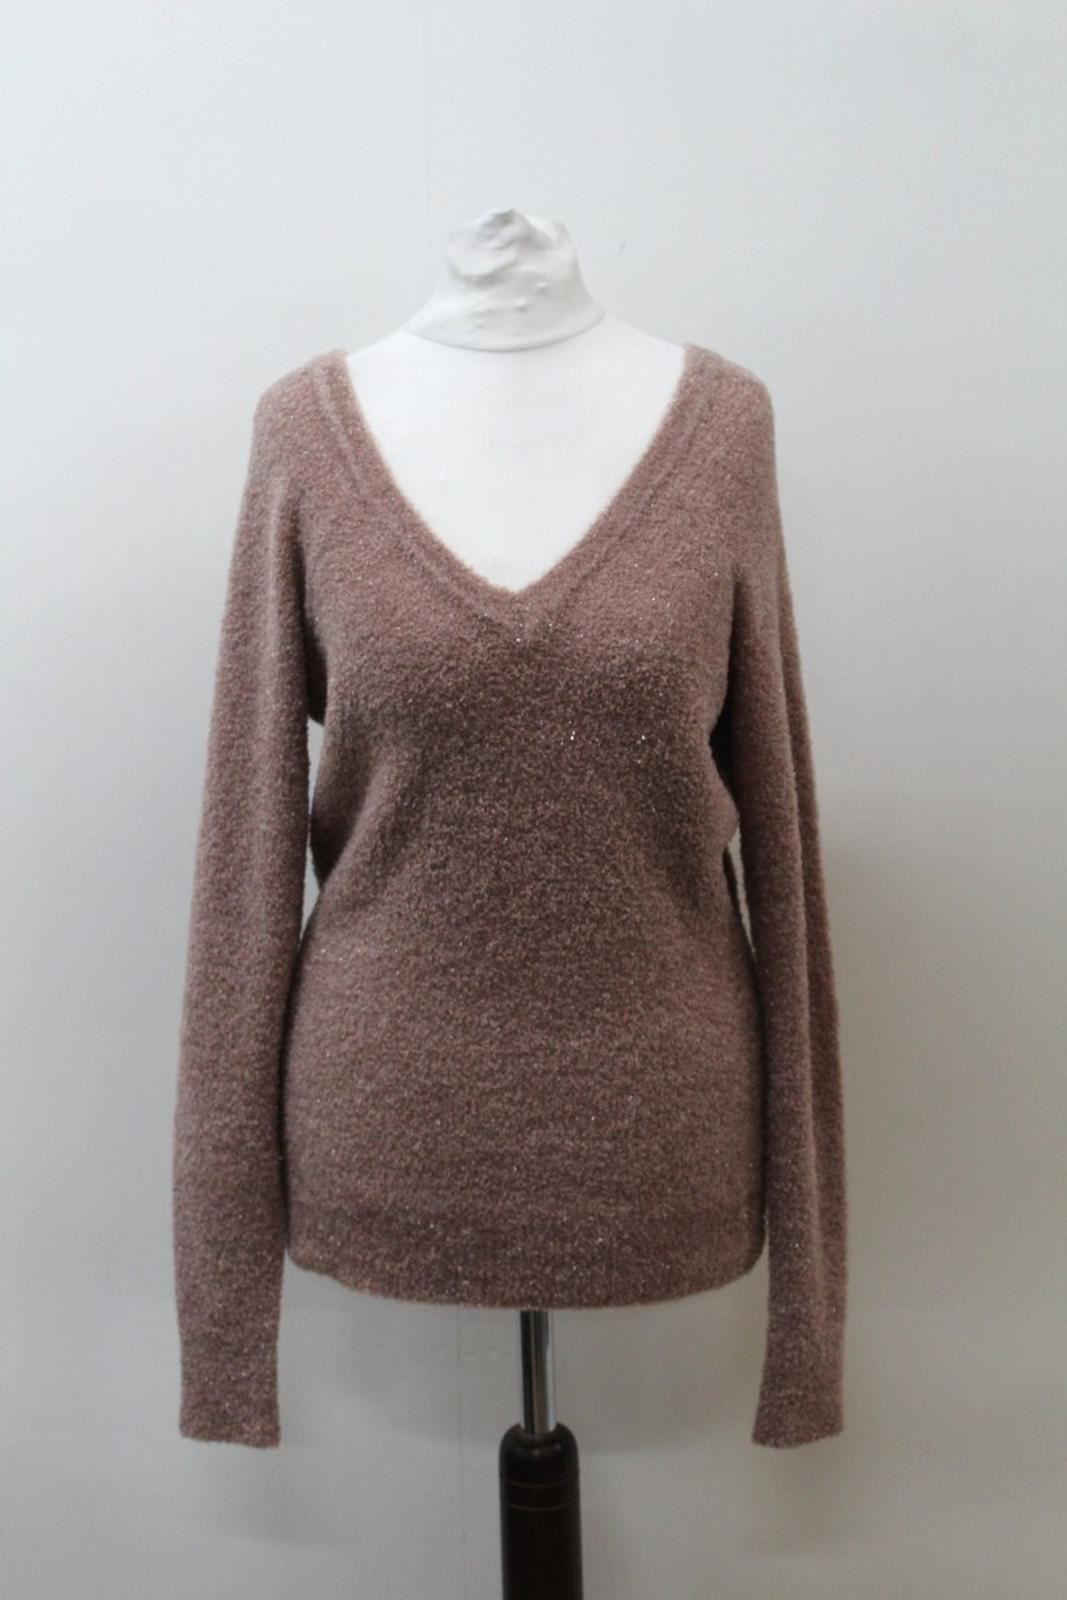 Reiss-Damen-Staubig-Rosa-Langarm-V-Hals-Fluffy-Glitzernde-Pullover-ca-M